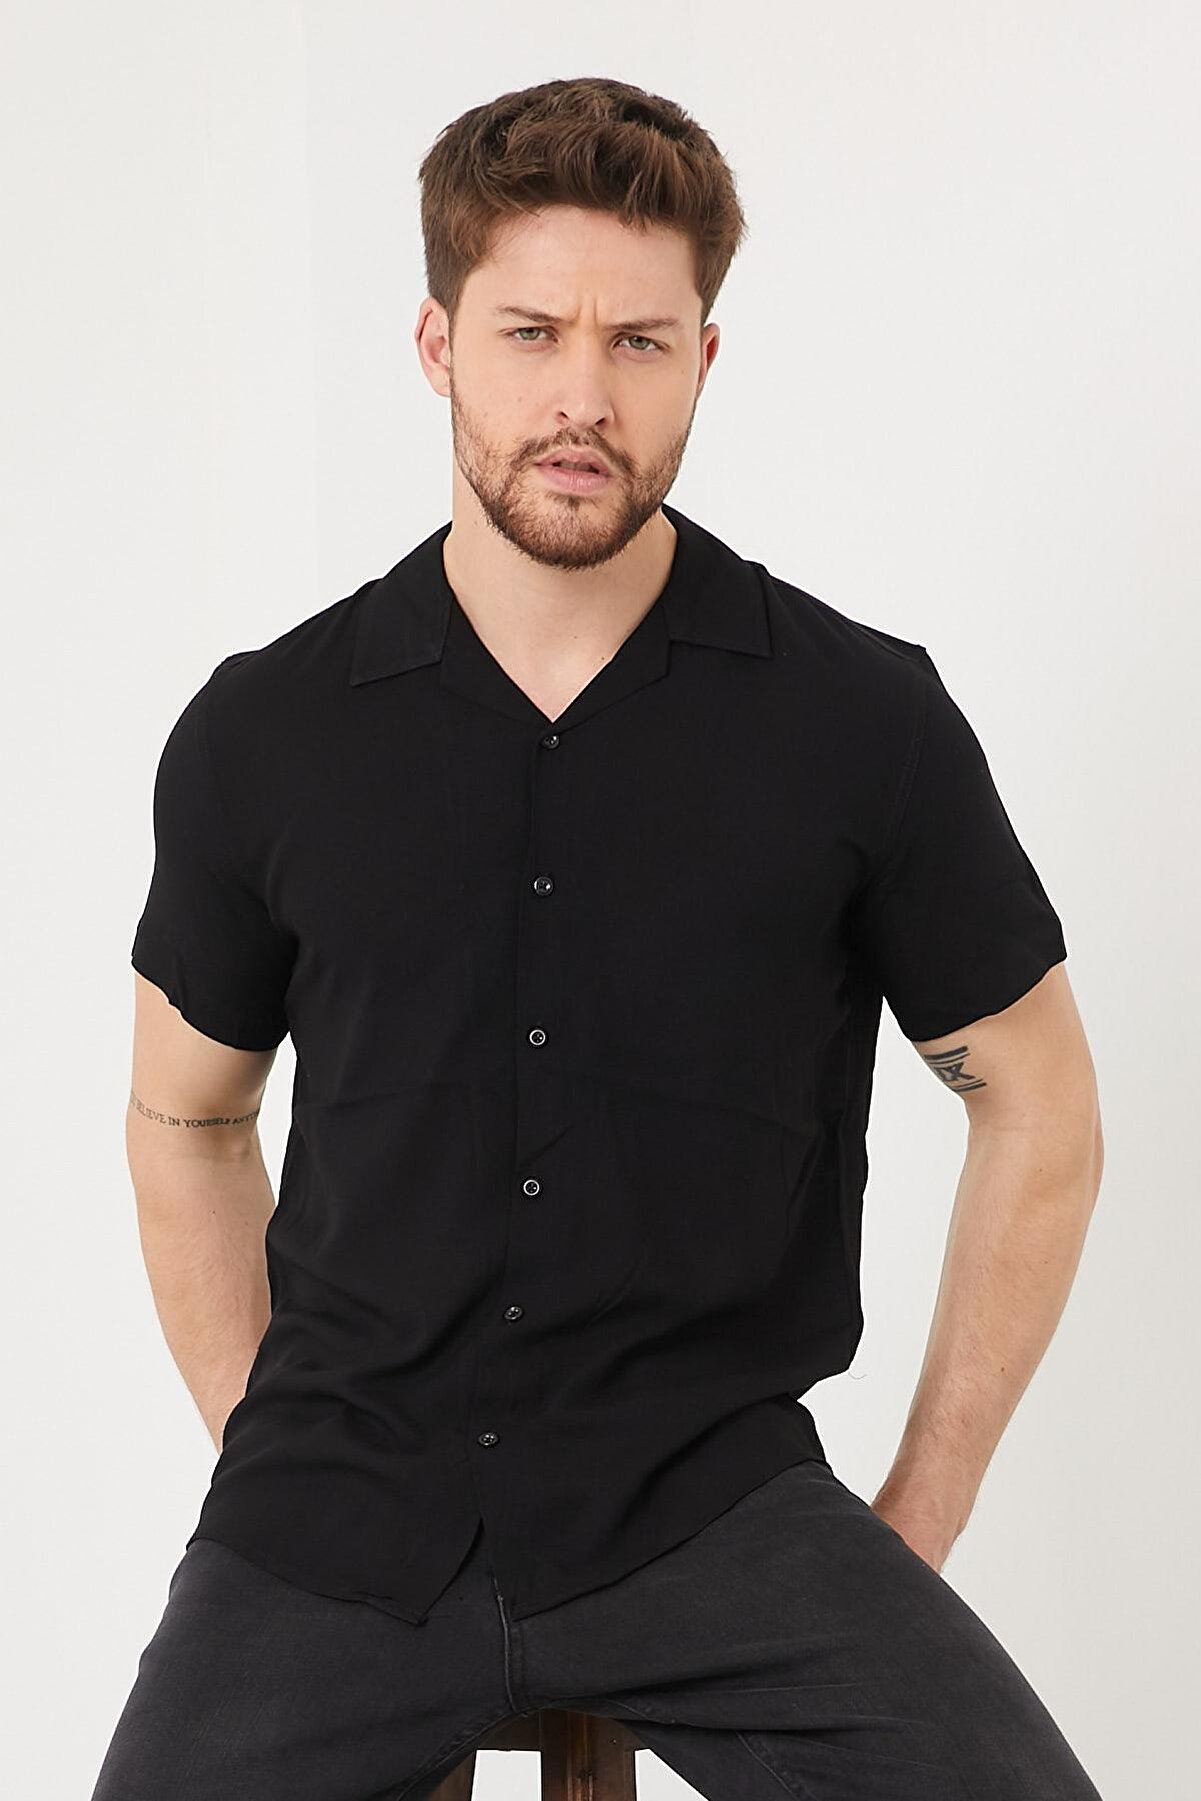 Enuygunenmoda Erkek Slim Fit Keten Apaş Yaka Kısa Kollu Gömlek Siyah